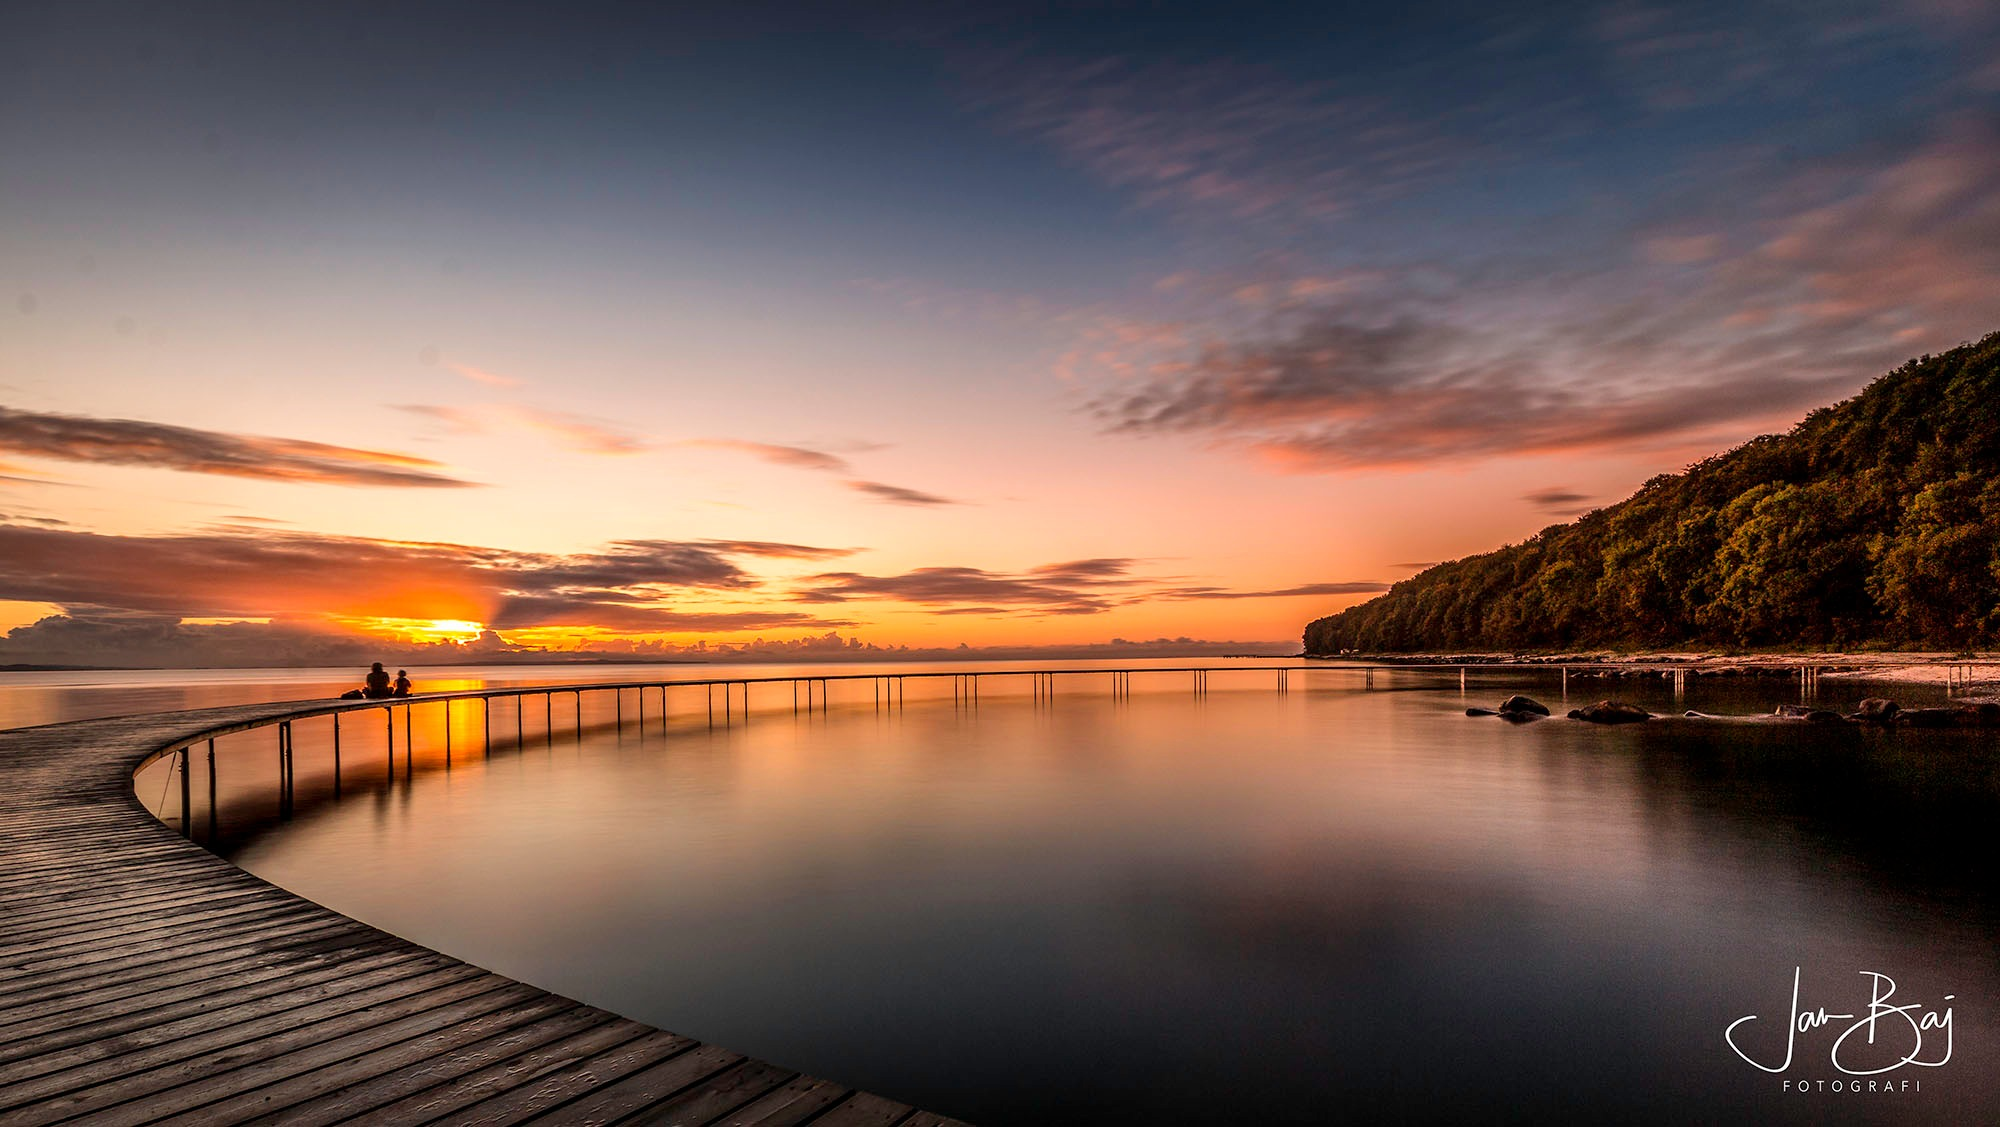 Sunrise  by Jan Baj Fotografi